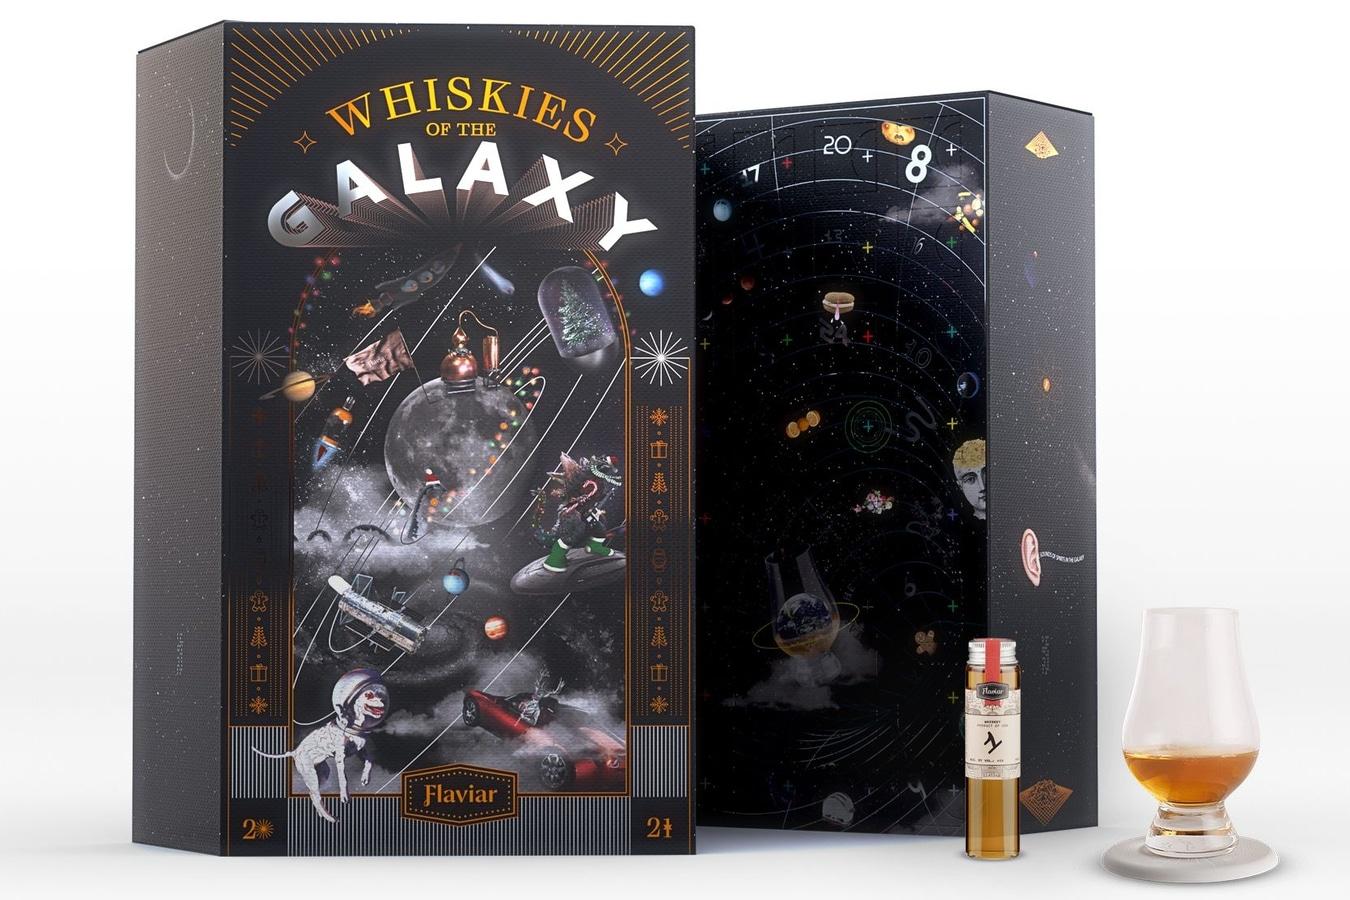 Flaviar whiskies of the galaxy